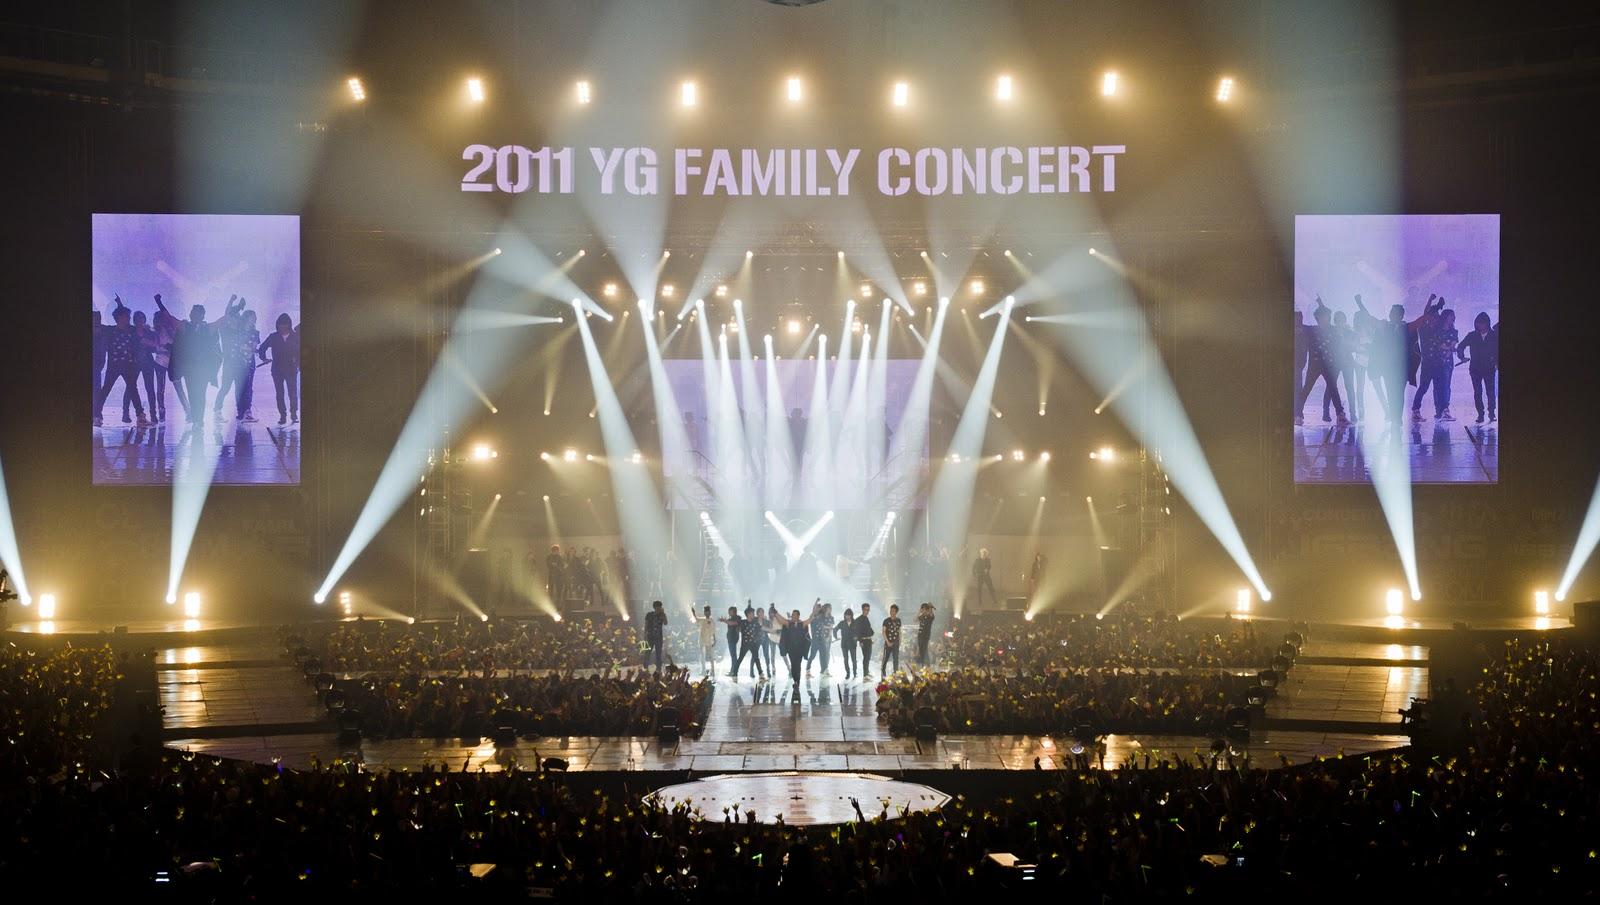 PopinSe7en: [PICS] YG Family Concert 2010 DVD - Thank You Box